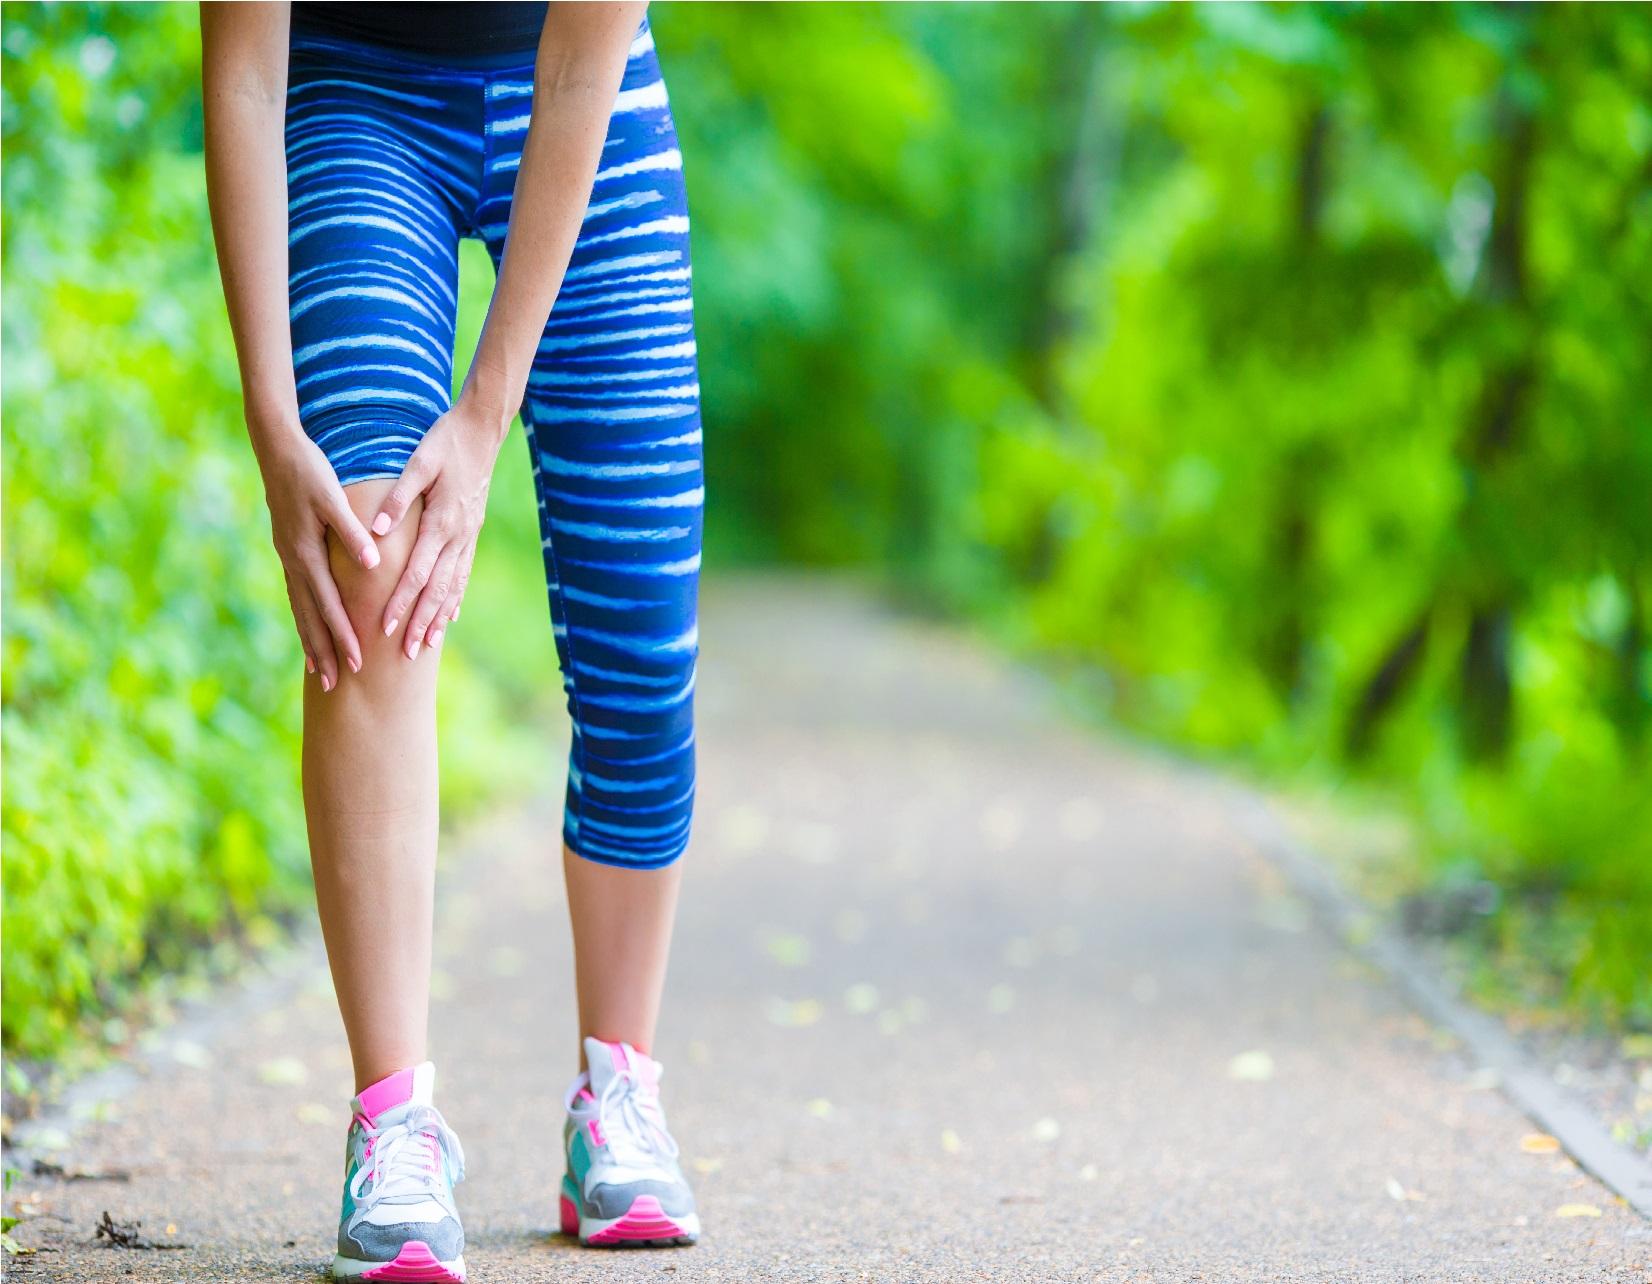 Enjoying the Season: Chiropractic Tips for Summertime Pain